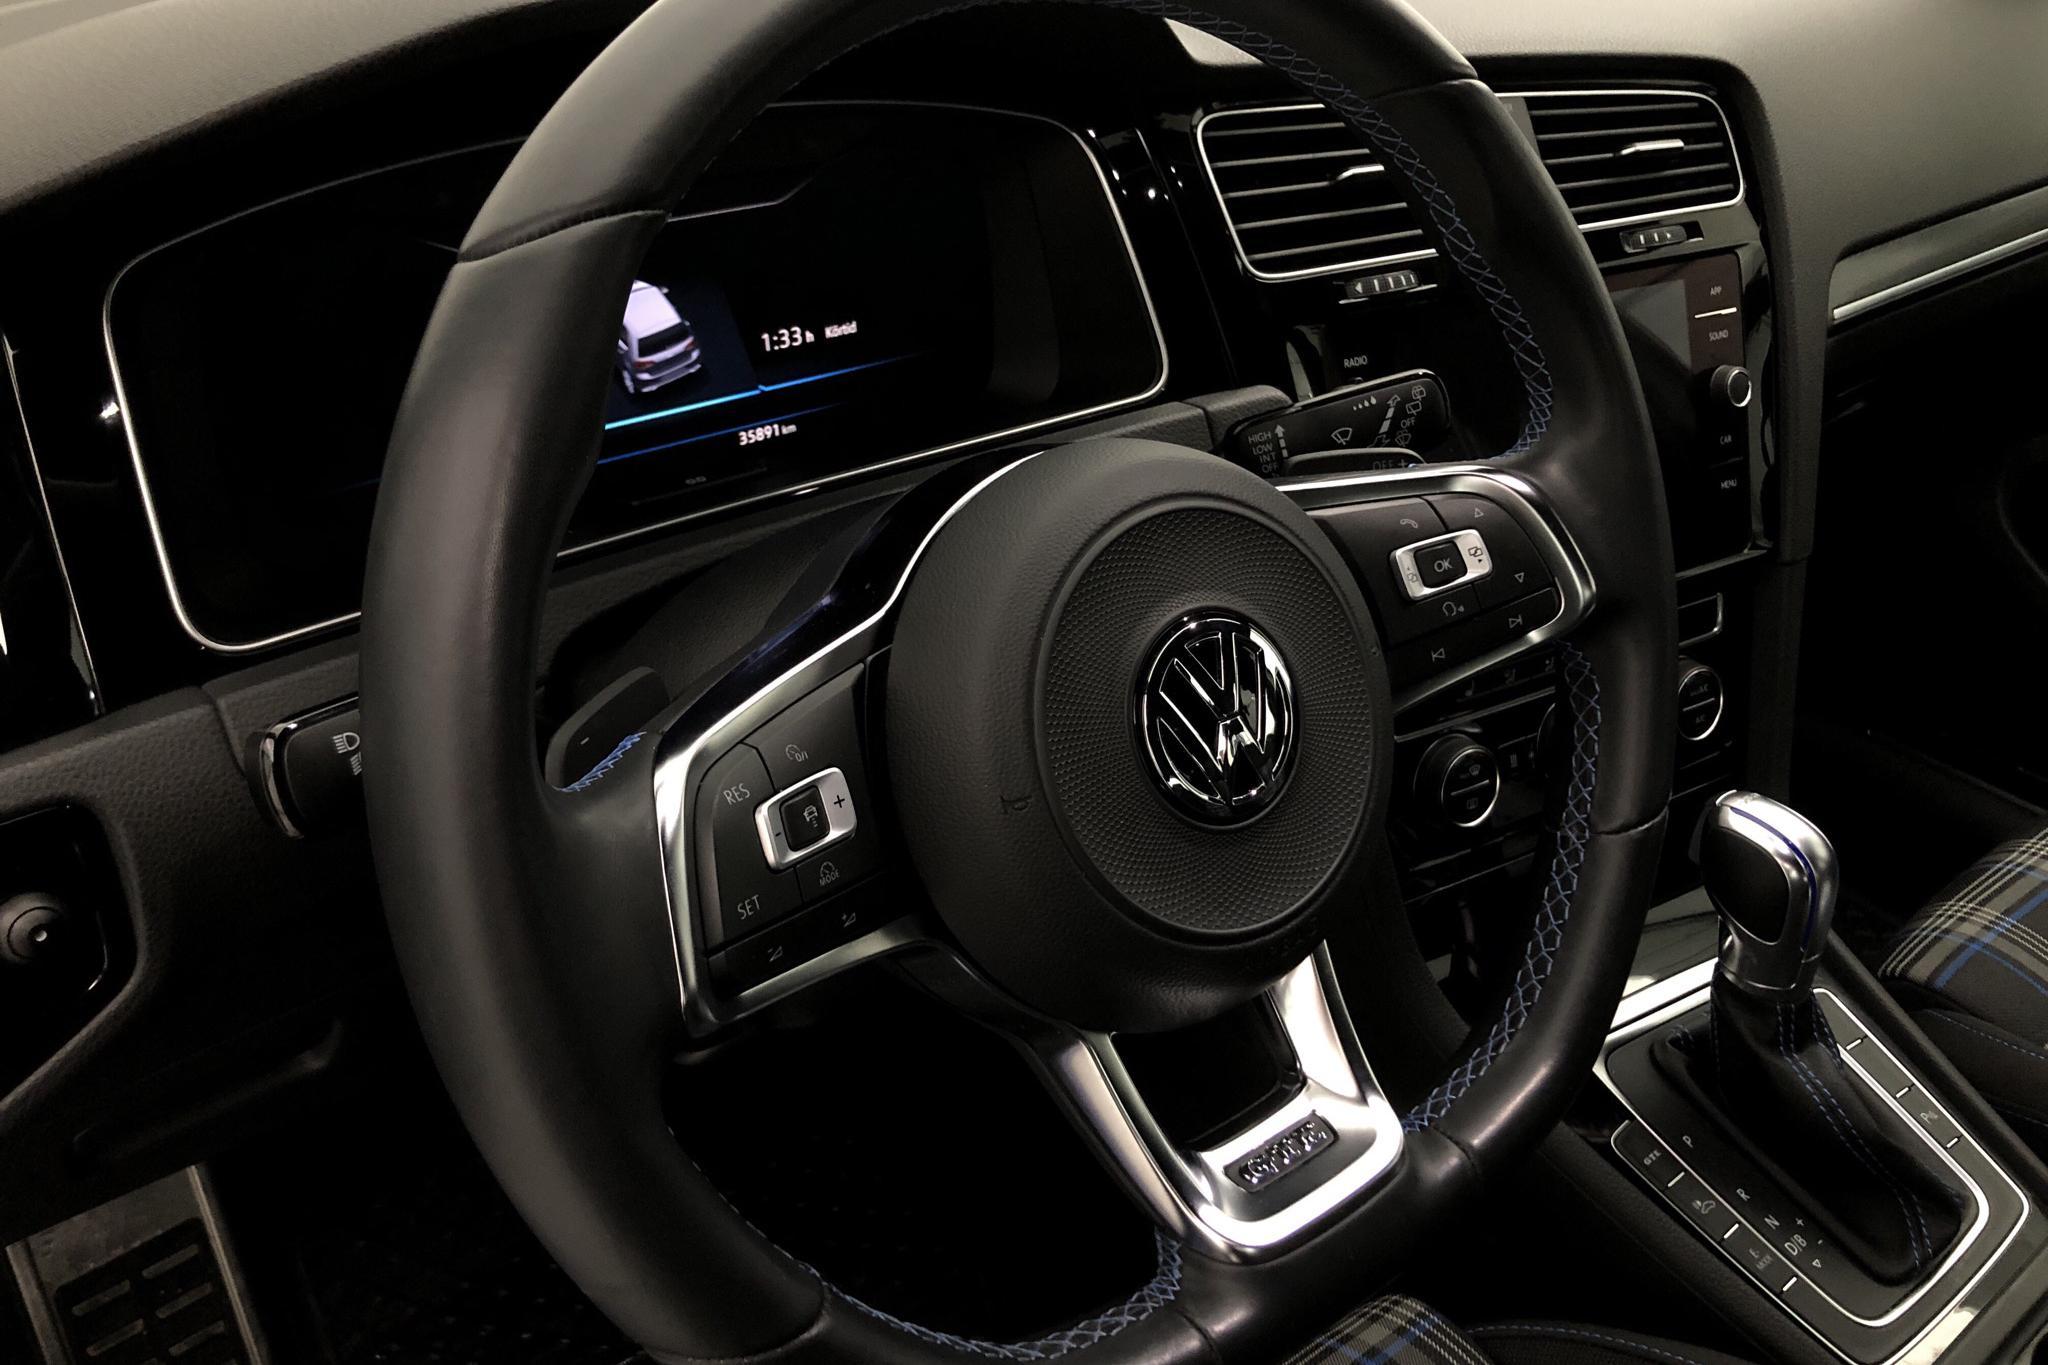 VW Golf VII GTE 5dr (204hk) - 3 588 mil - Automat - Dark Grey - 2018